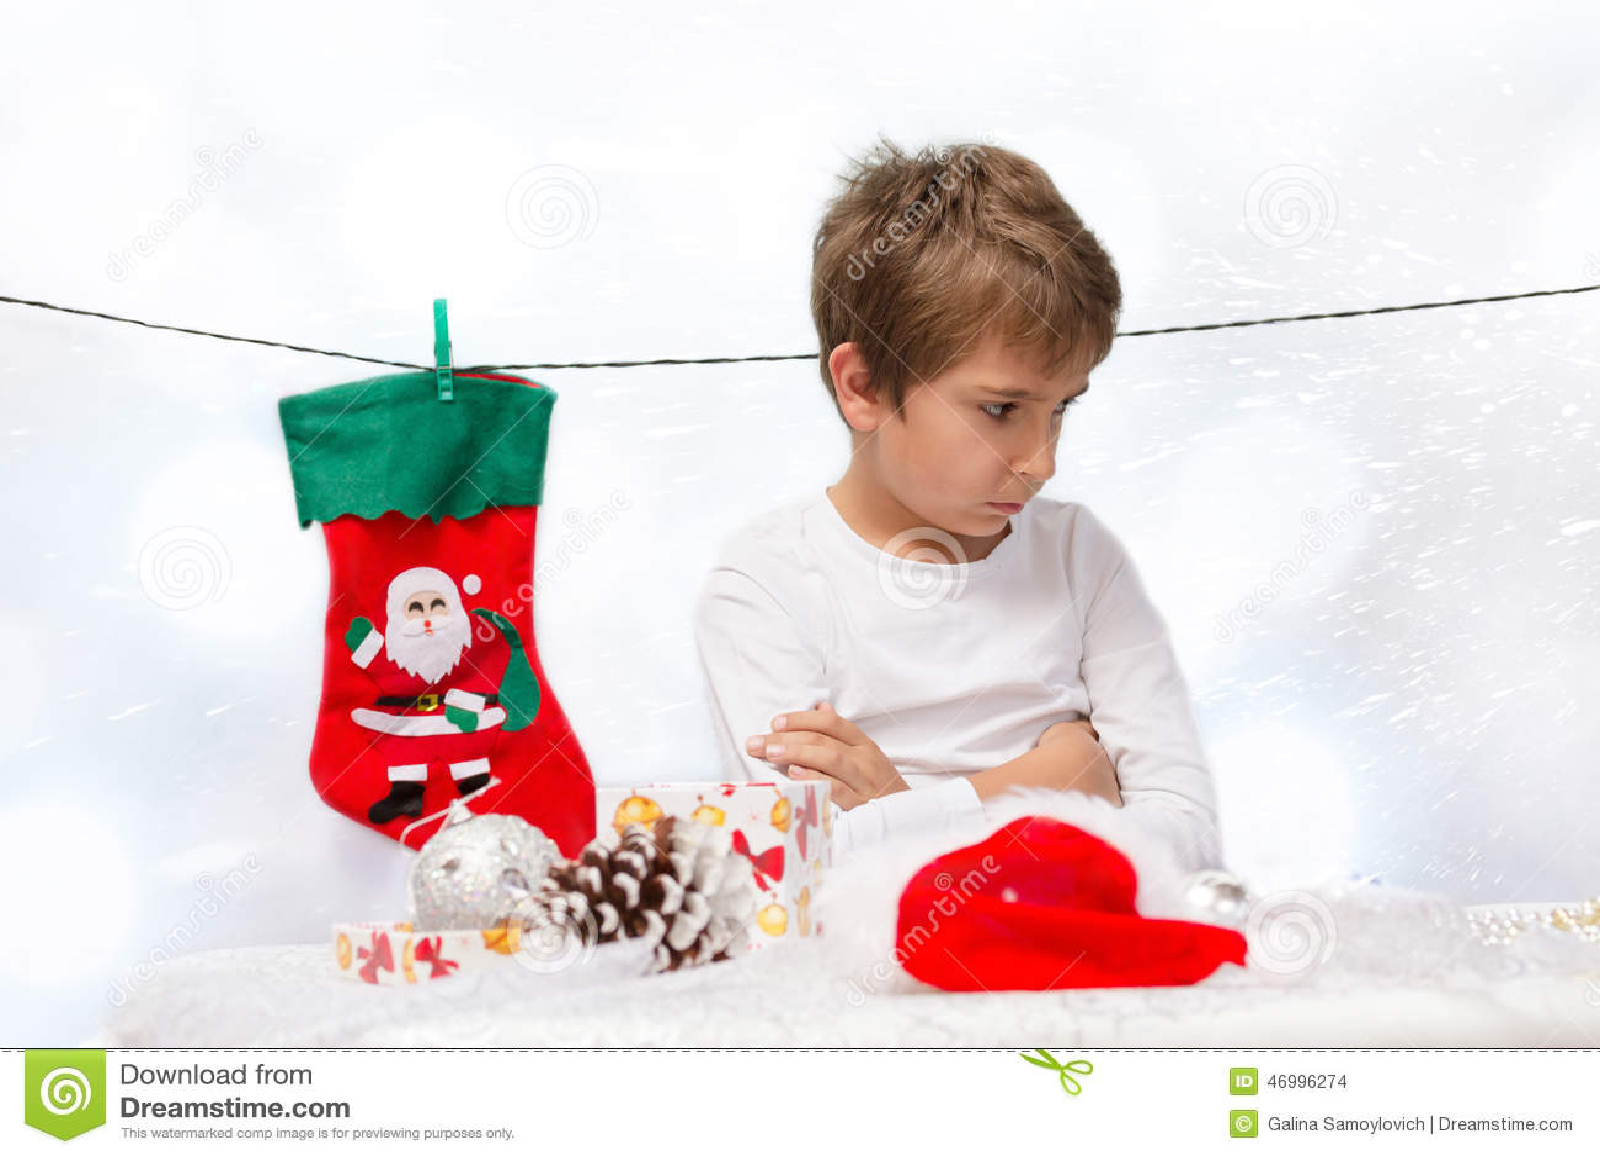 Sad Boys With Christmas Decorations. Stock Photo - Image of white, background: 46996274